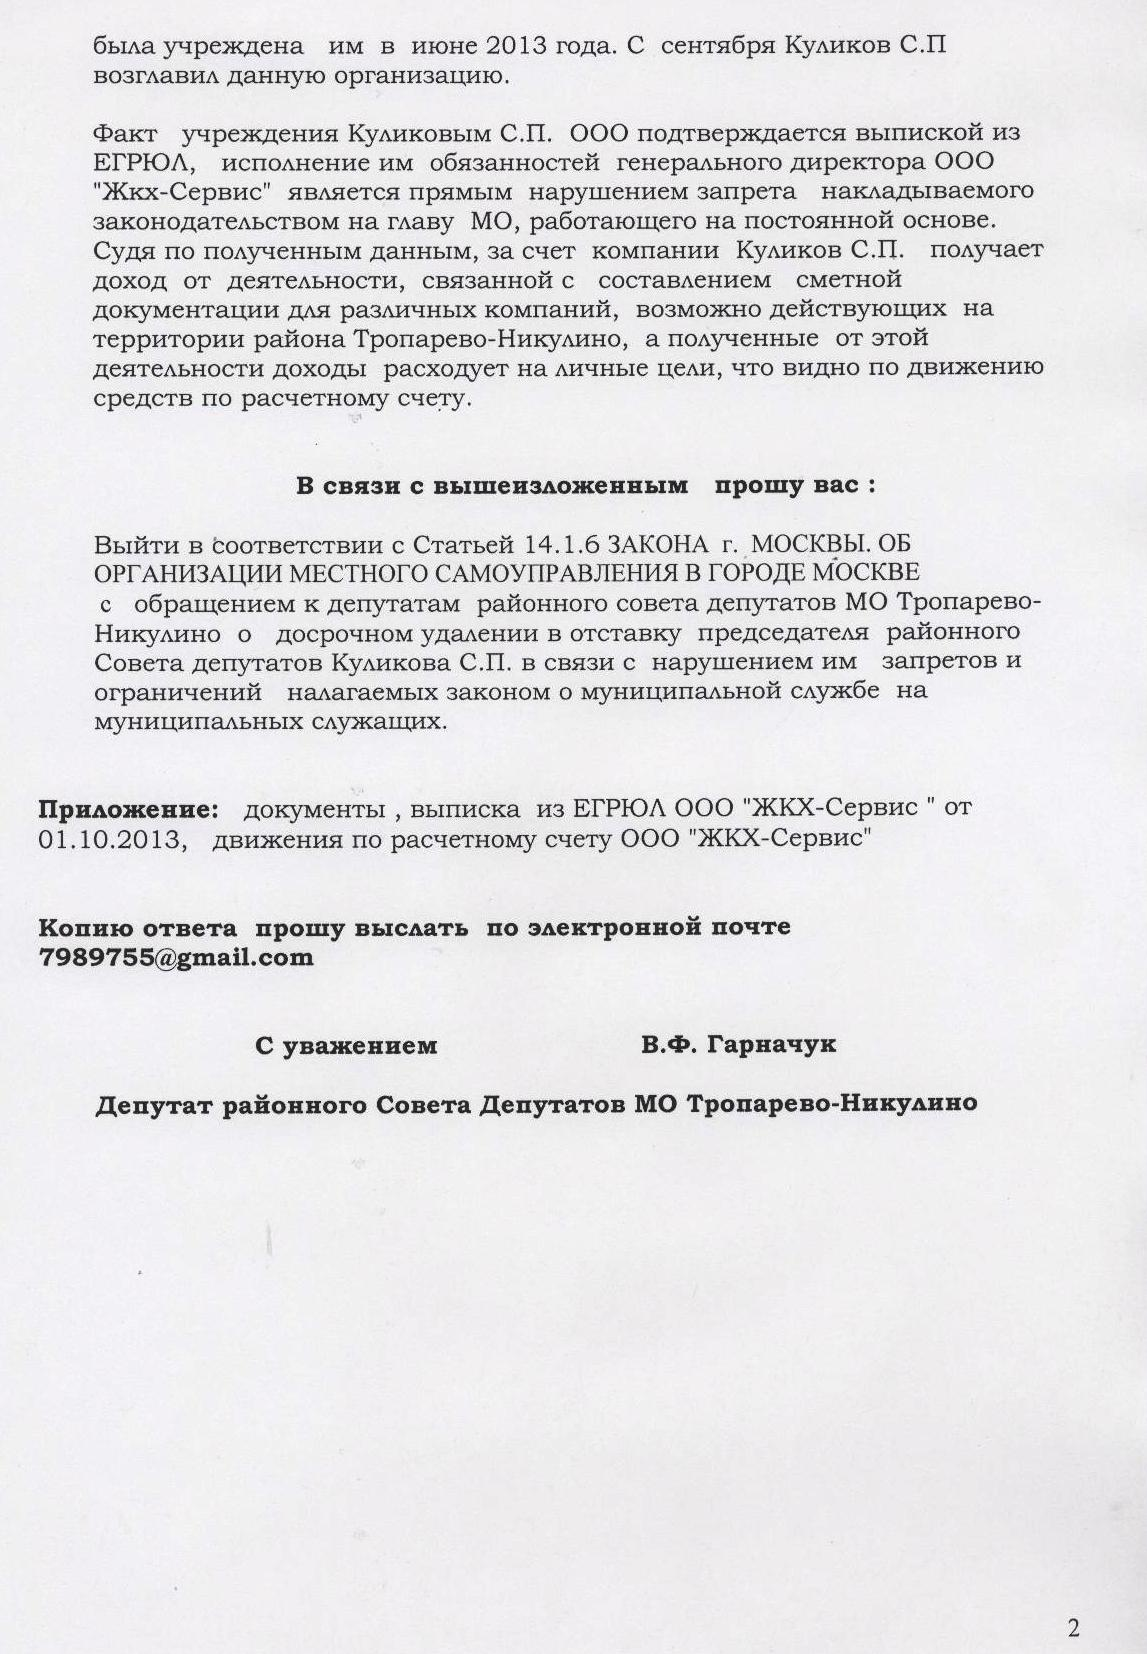 обращене собянин  по куликову 9 .10.13 1